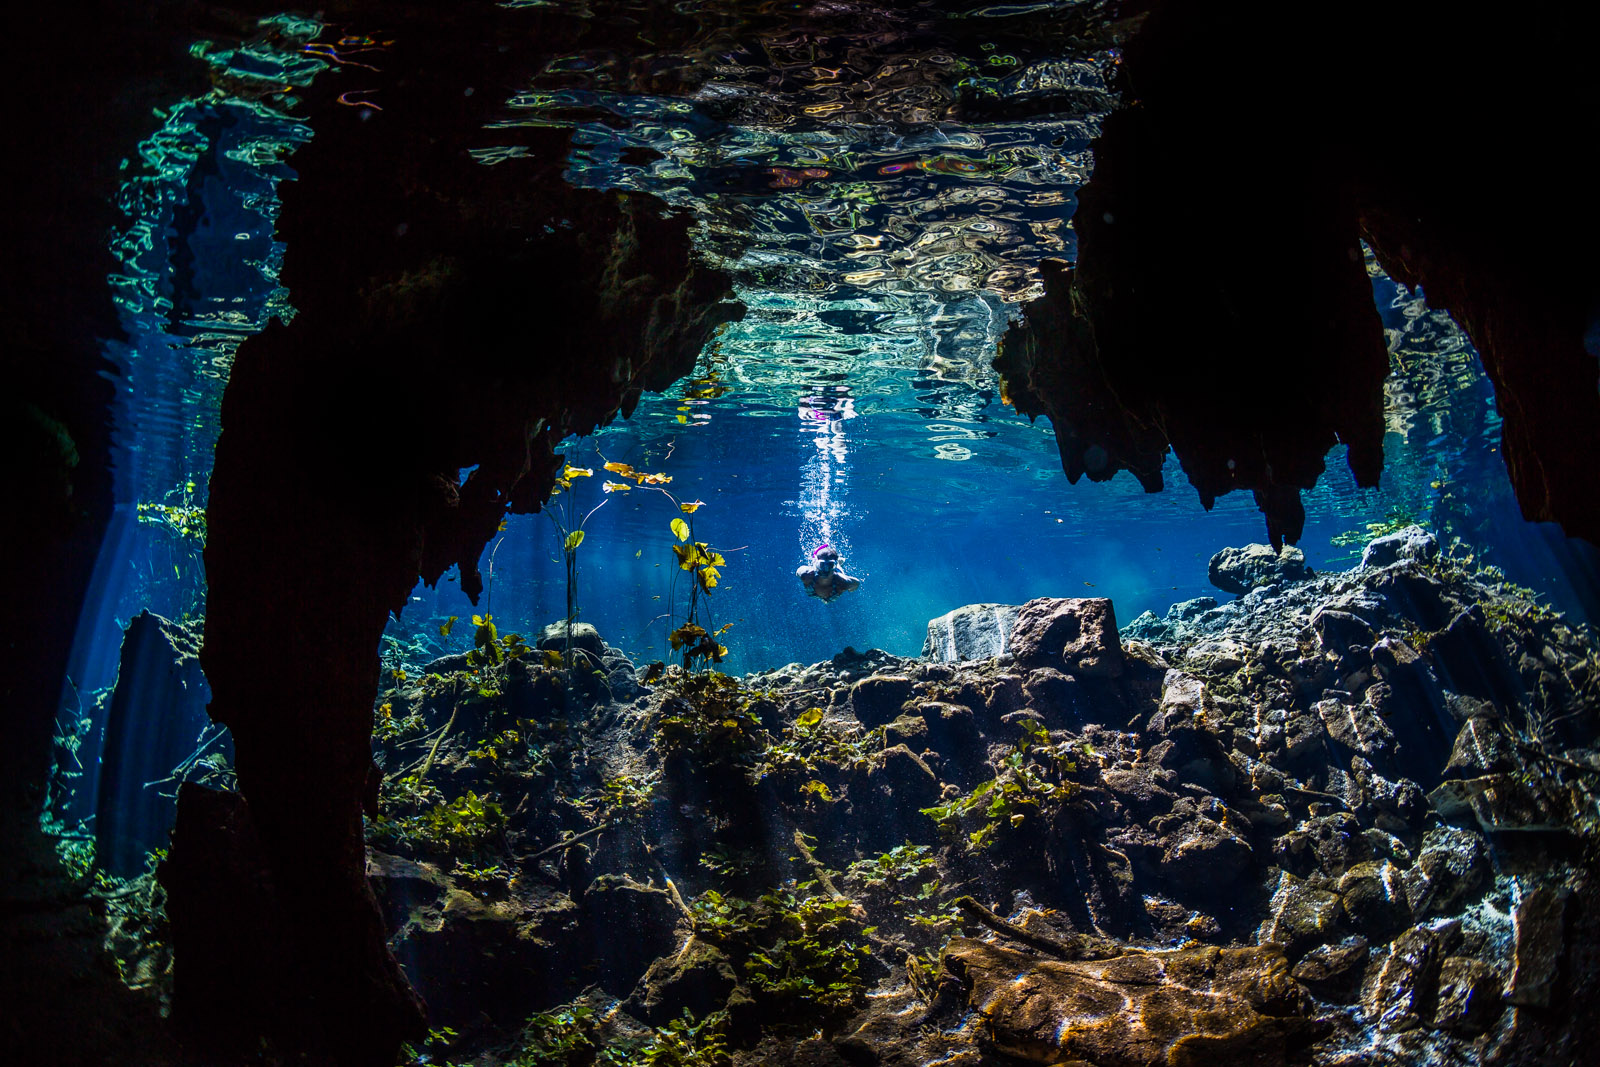 Underwater photographer - Undervattensfotograf - Cenote - Sötvattenskälla - Mexico, Tulum, Akumal, Mexiko - Snorkeling - Snorkling